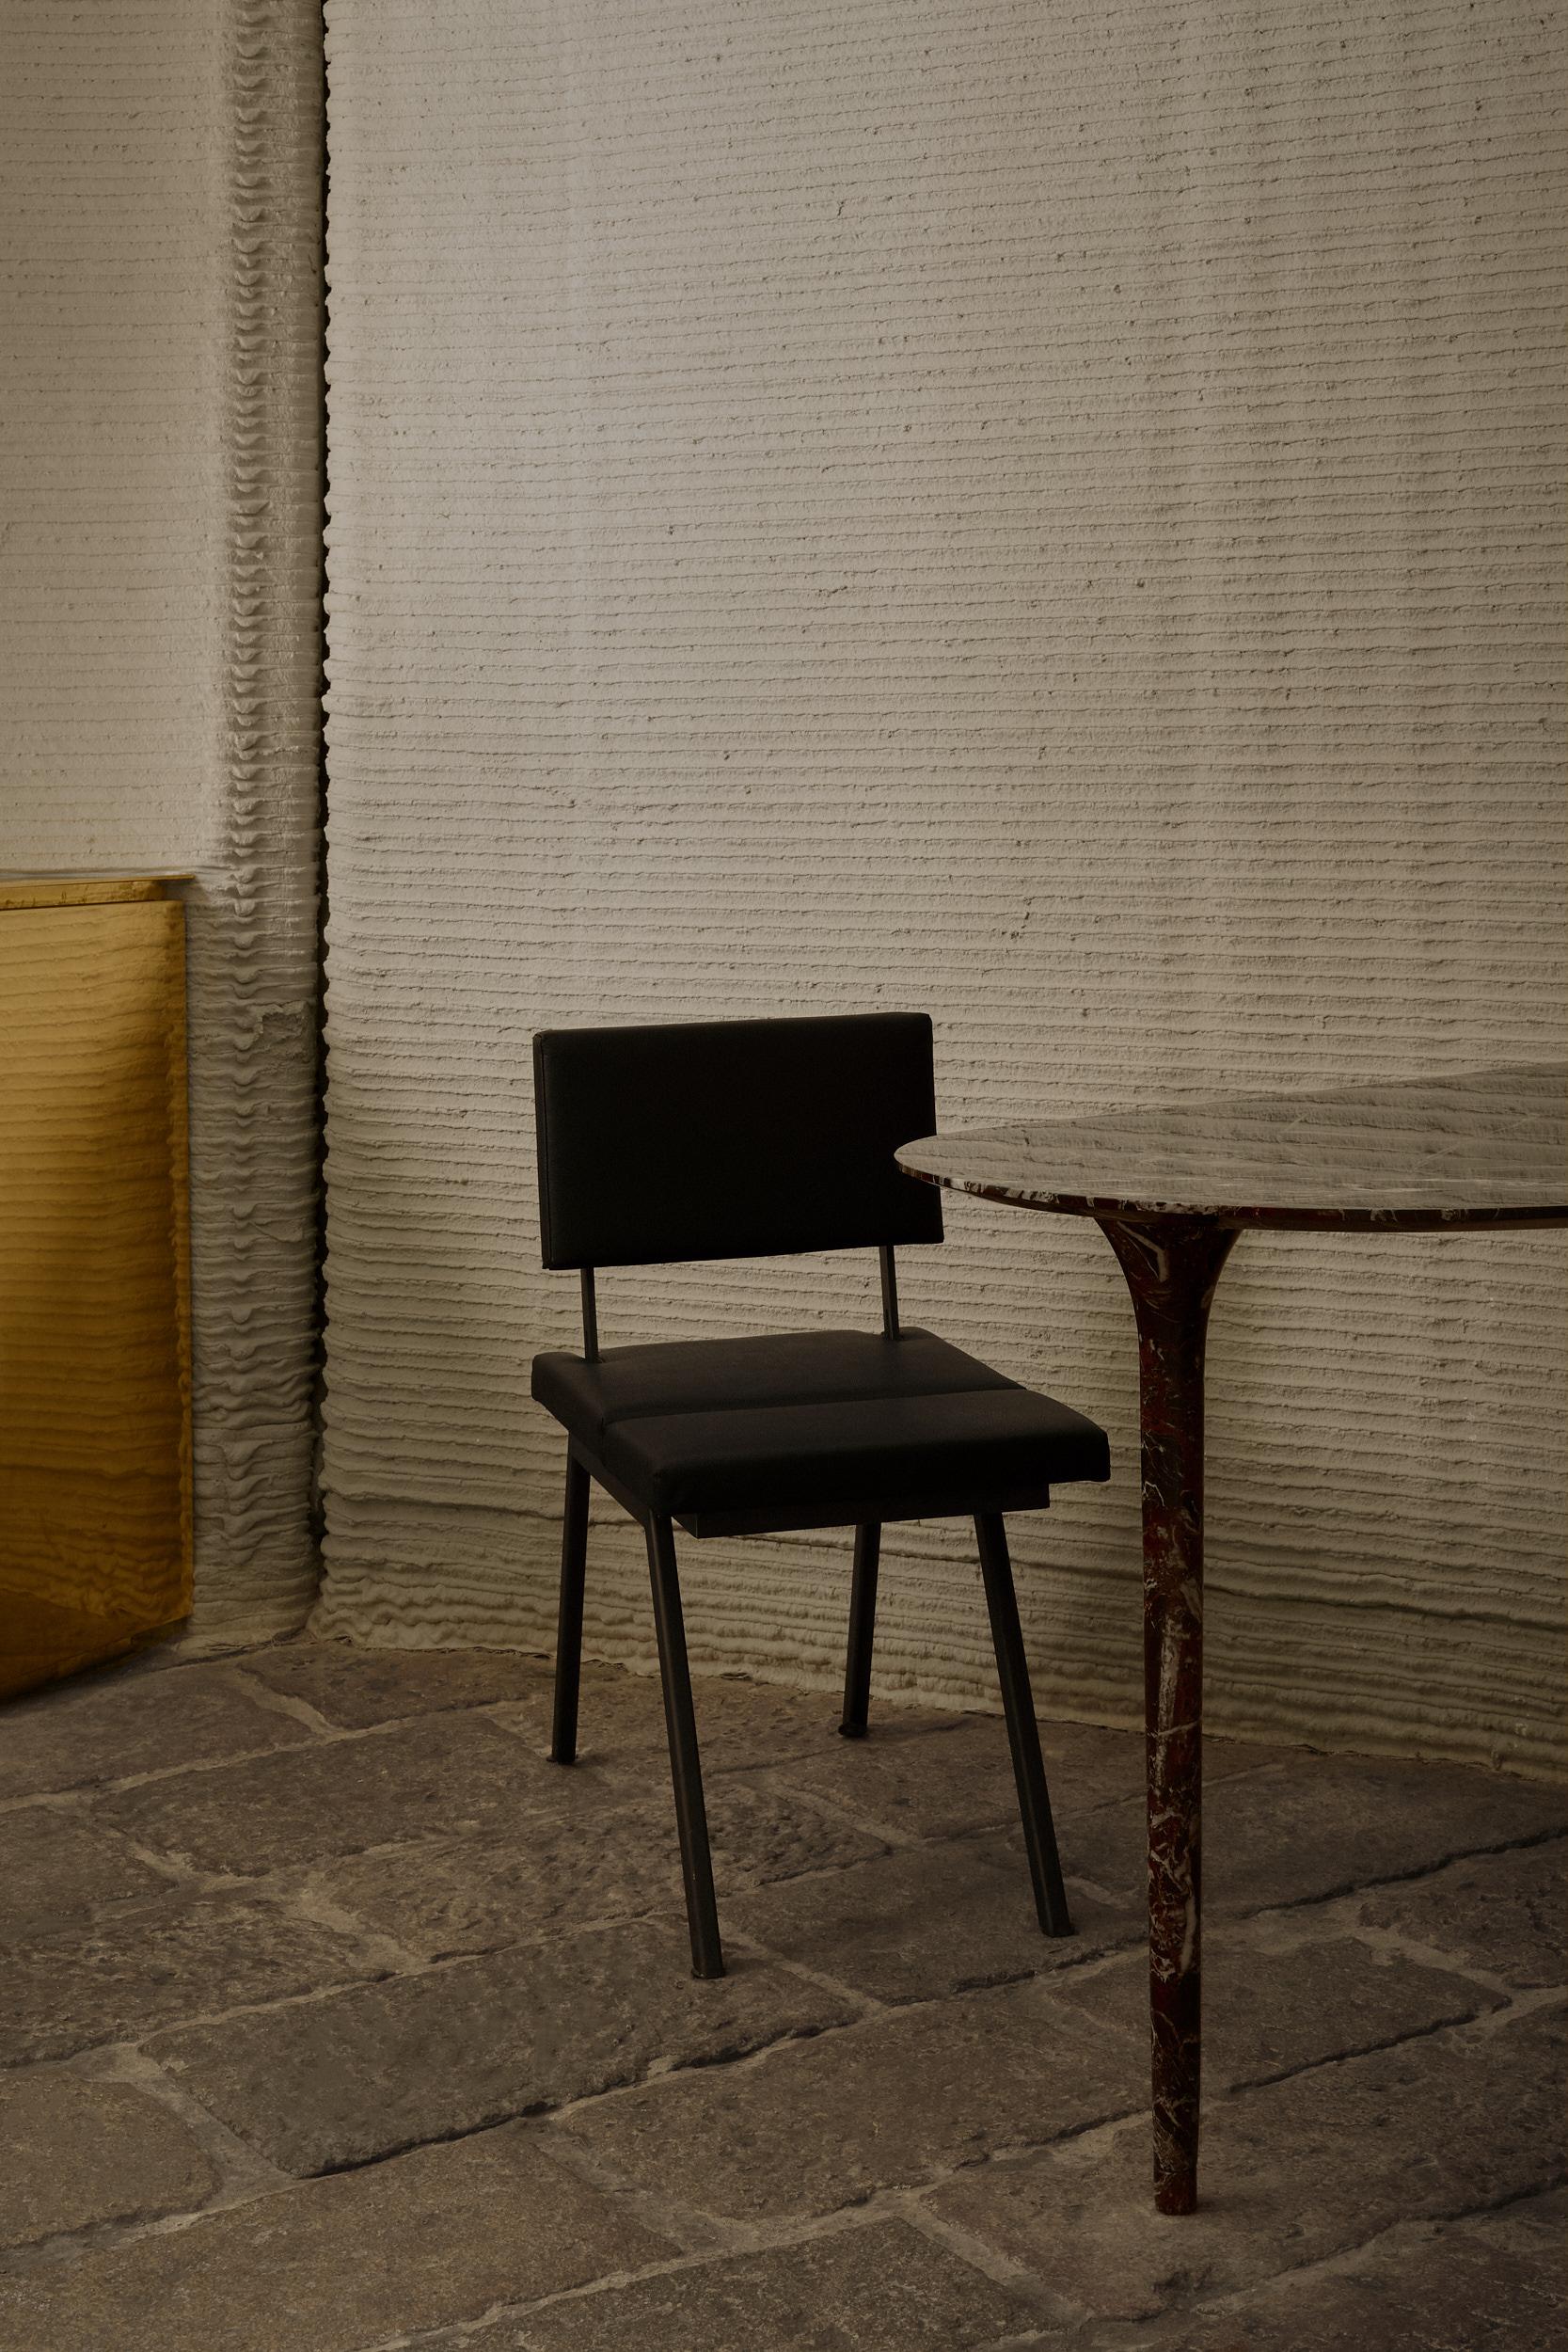 3D Housing 05 by CLS Architetti on Anniversary Magazine. Photo by Alex Lesage — threefold.jpg